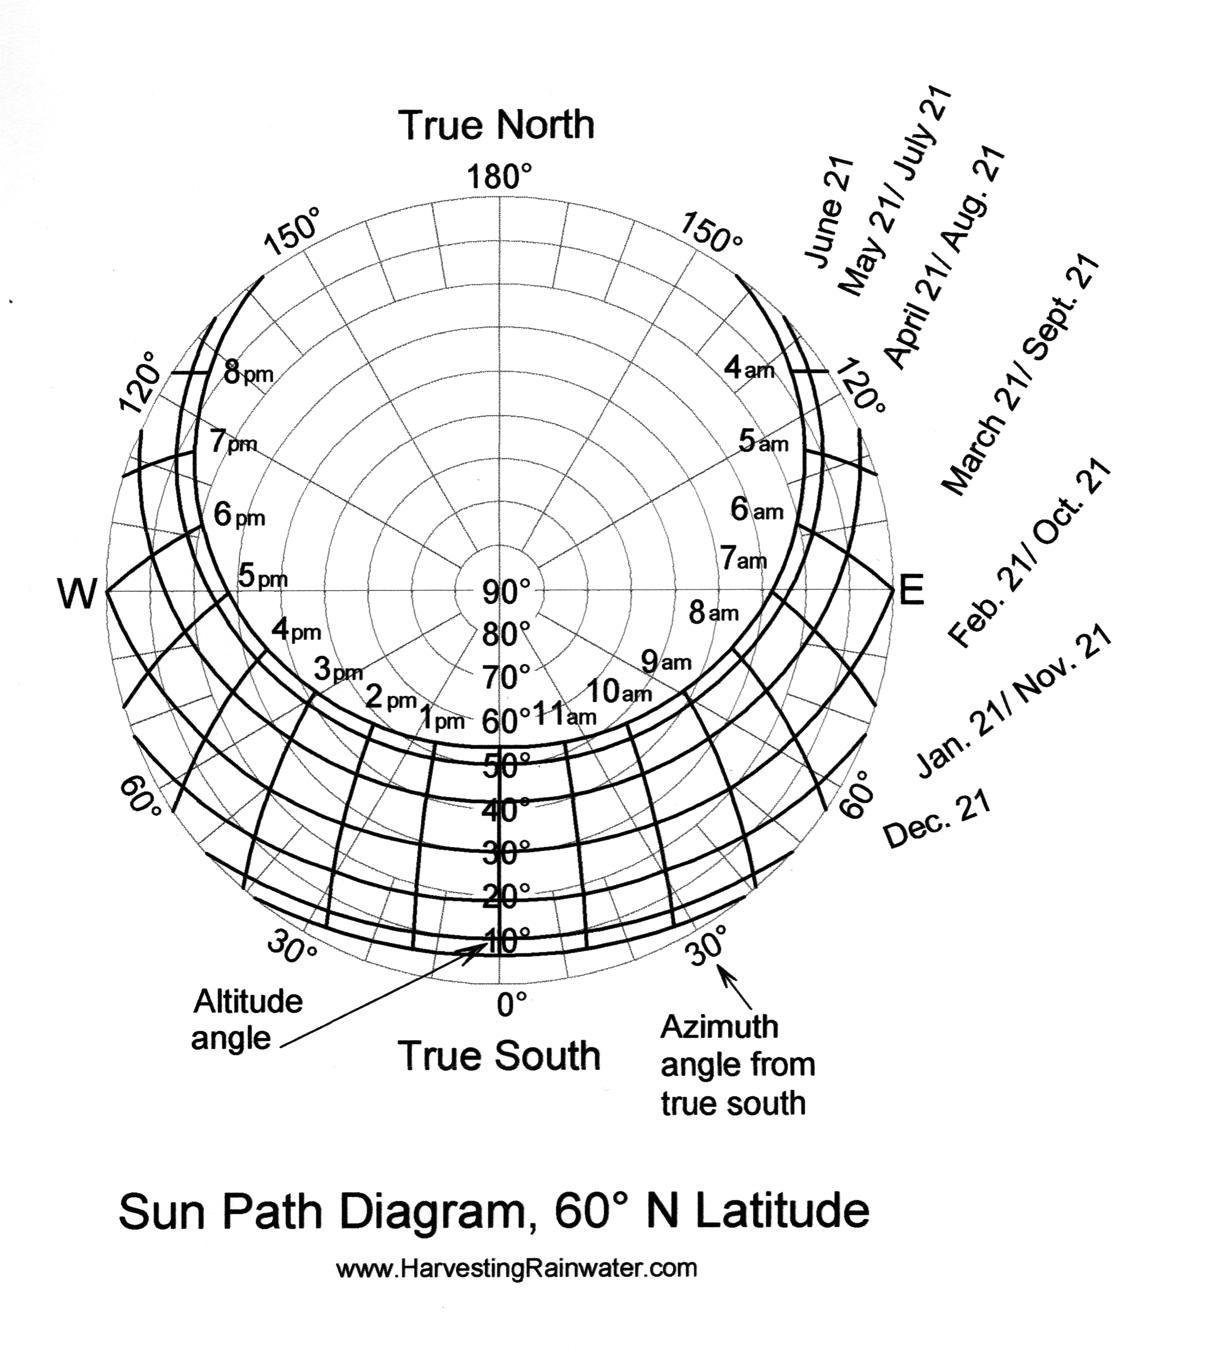 Sun Path Diagram 60o N Latitude